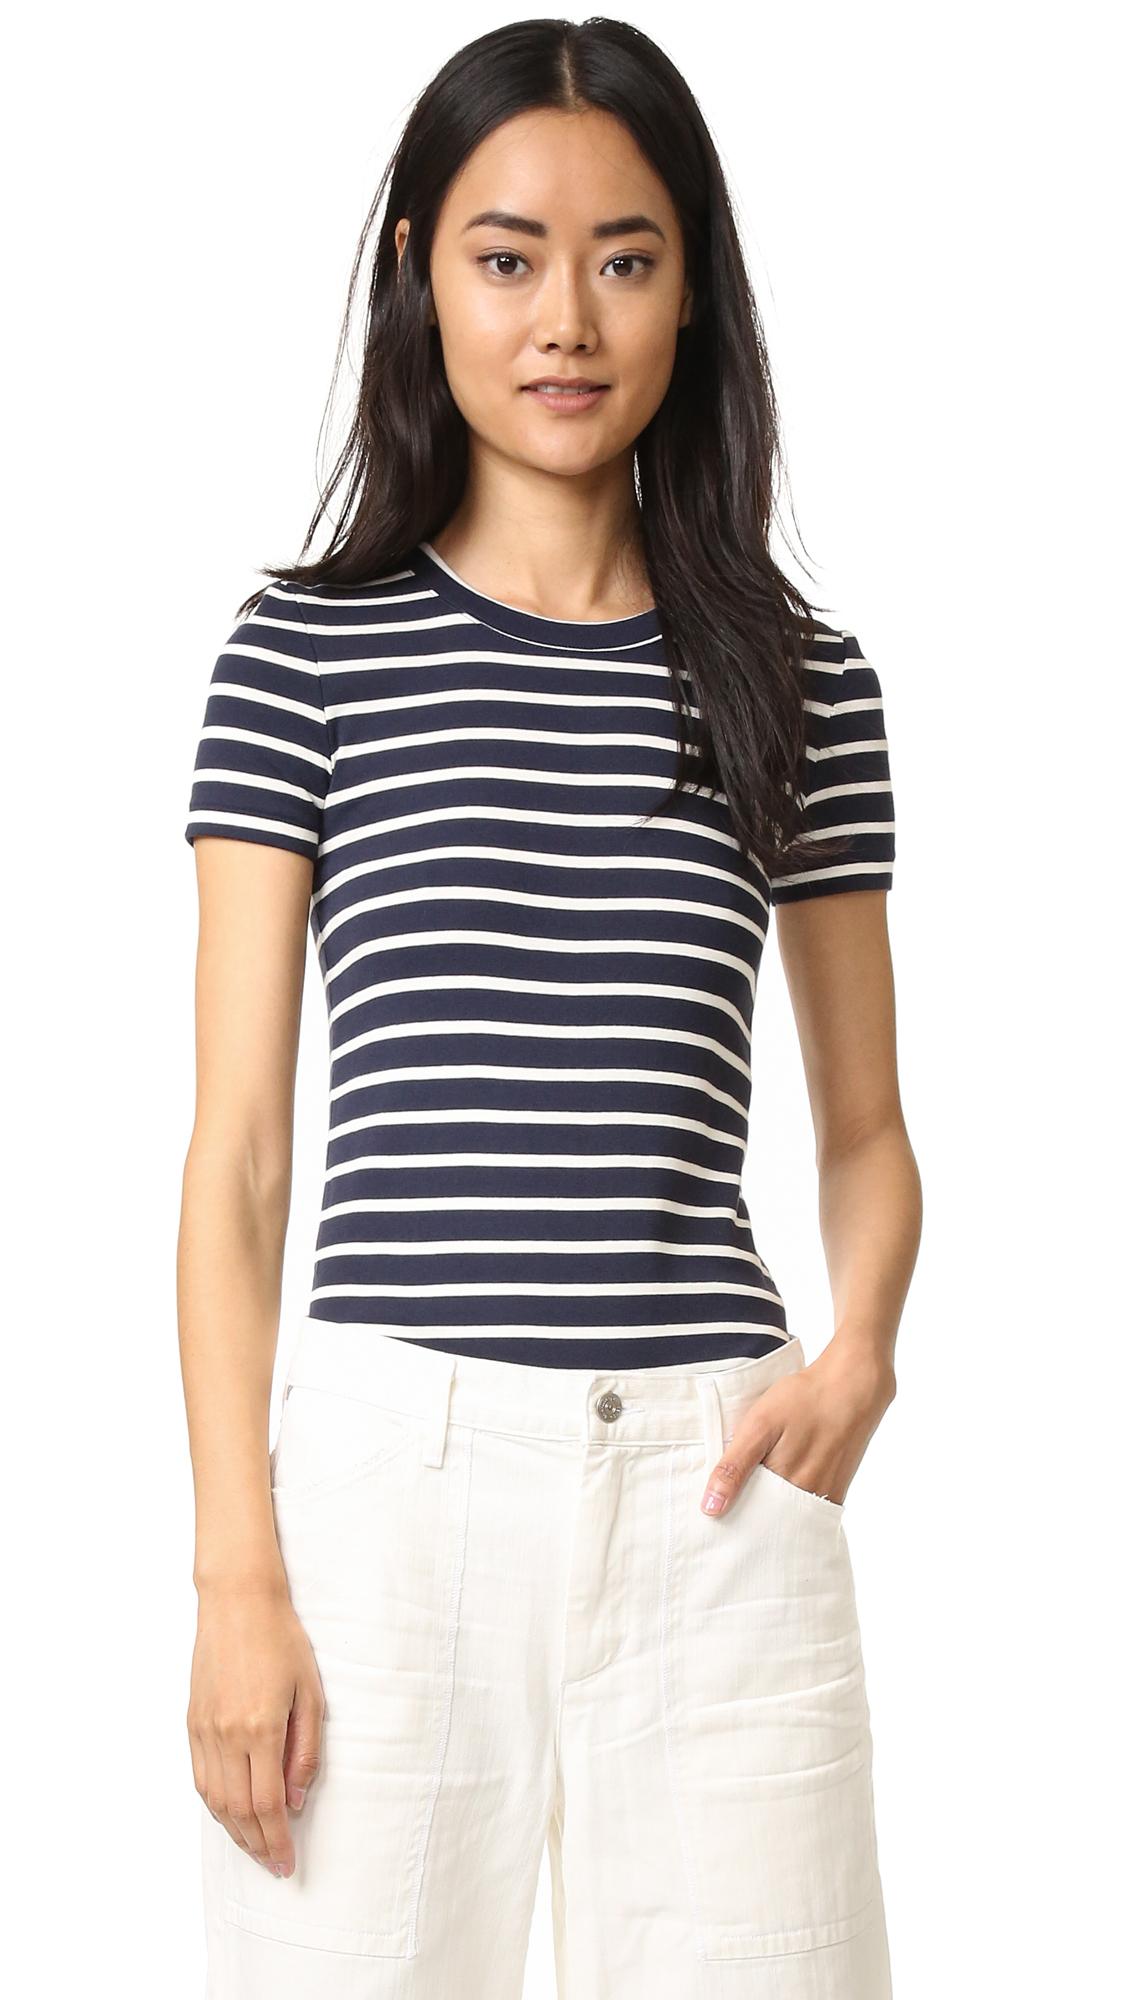 Petit bateau 1x1 iconic striped tee in multicolour lyst for Petit bateau striped shirt